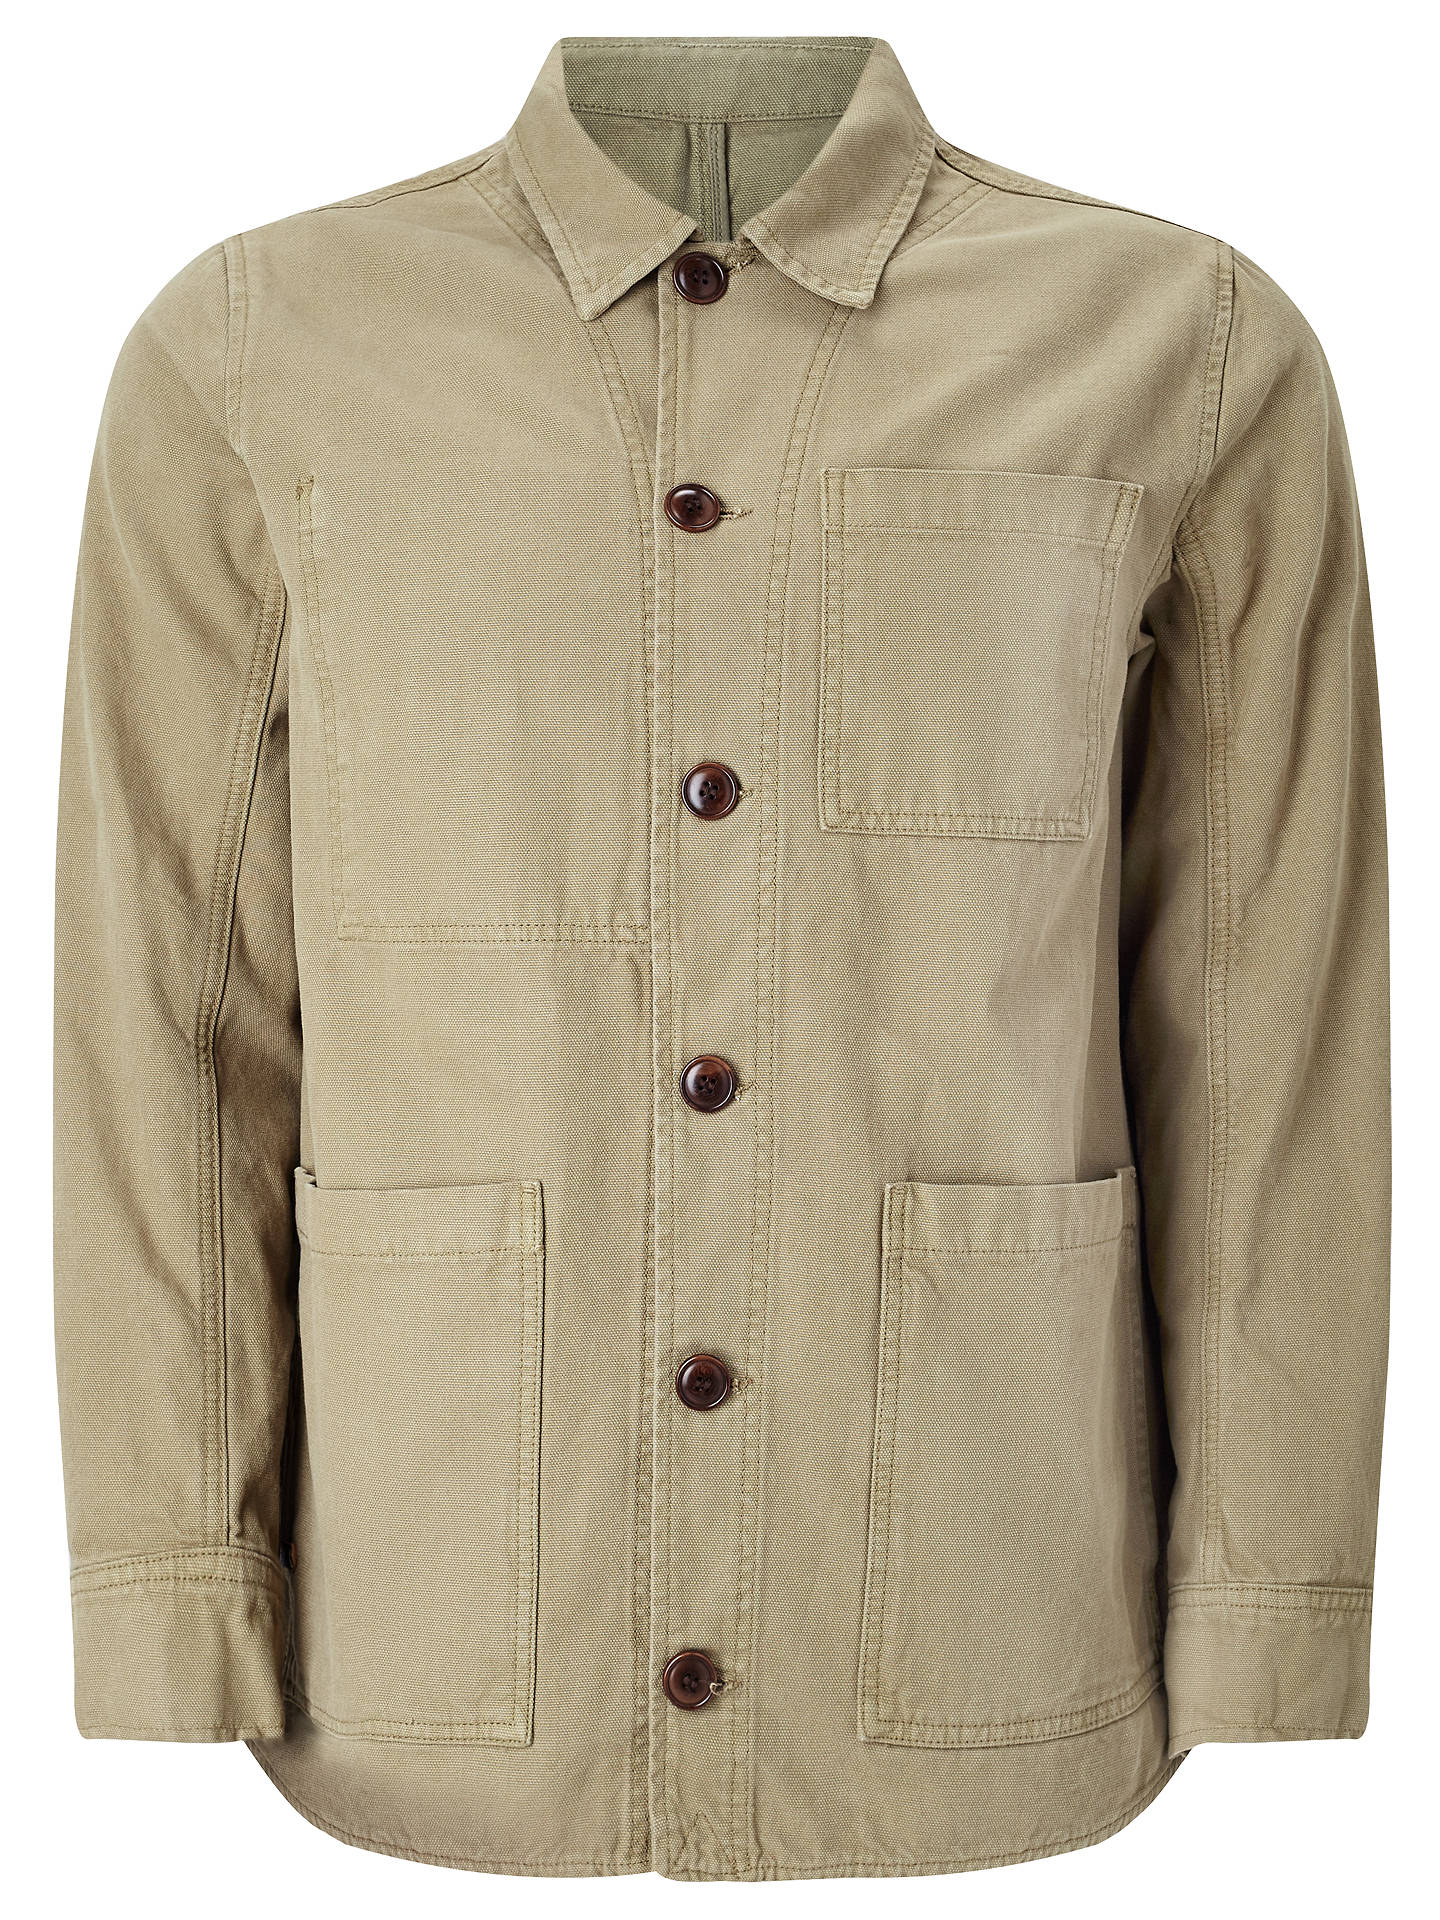 d82175b34b JOHN LEWIS & Co. Canvas Workwear Jacket at John Lewis & Partners